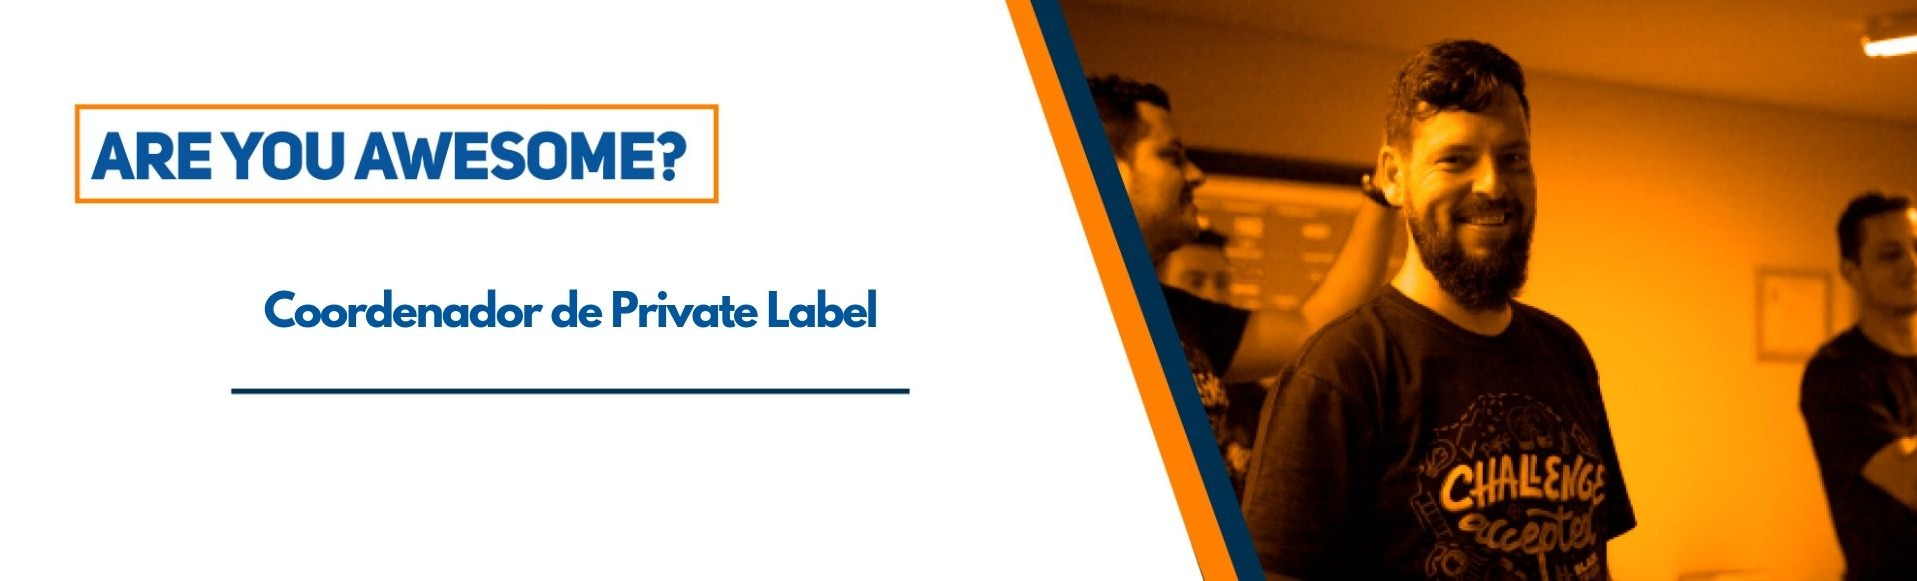 Coordenador de Private Label e Cadastro